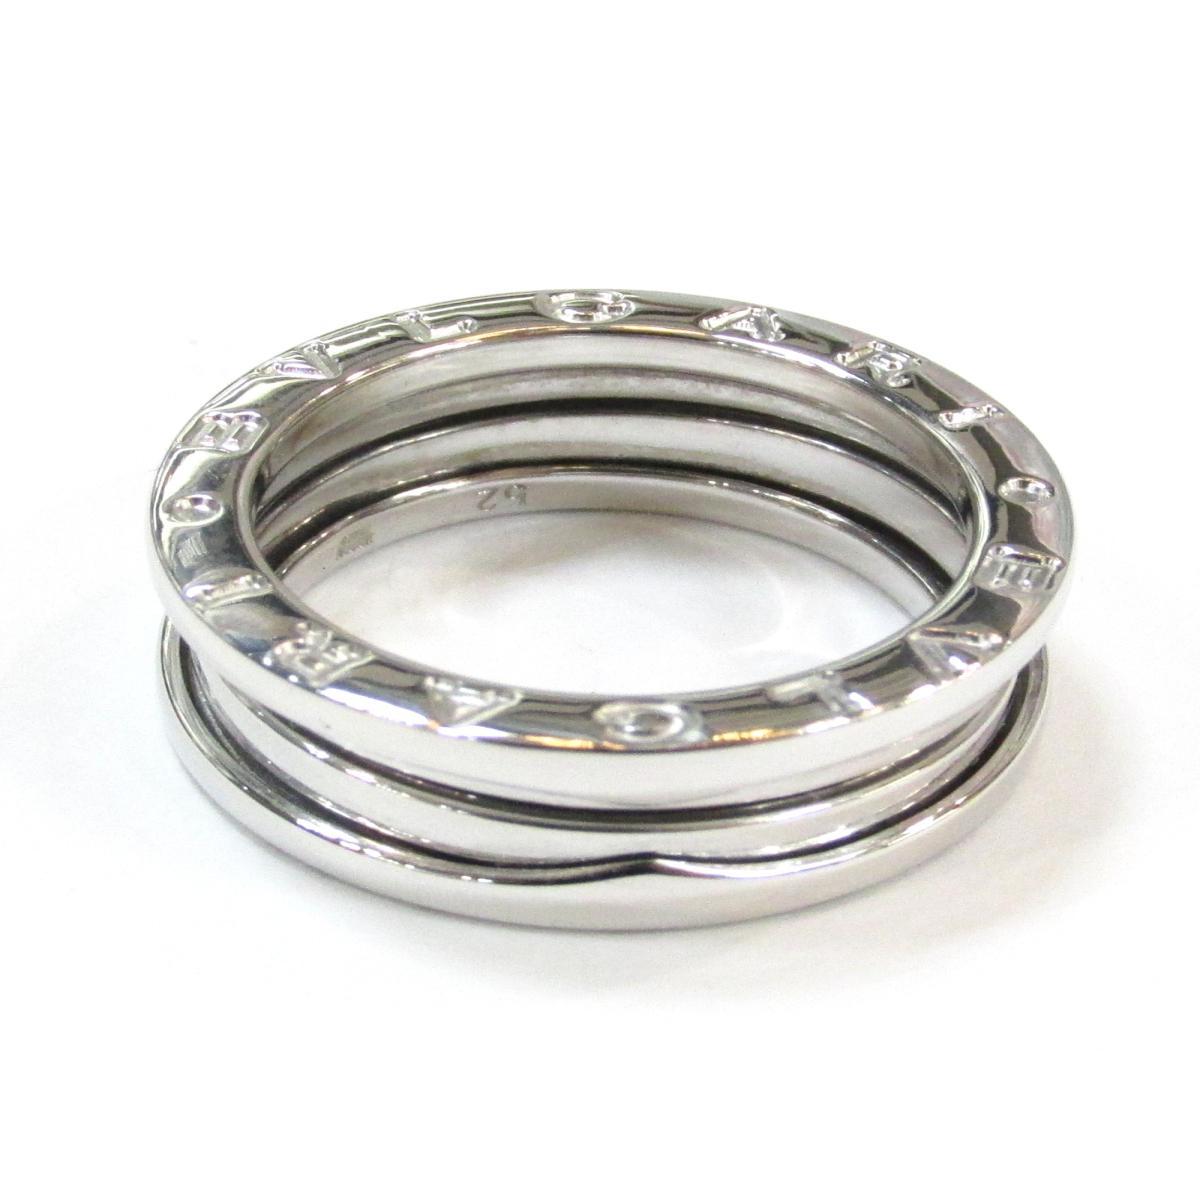 84762b25157a ブルガリ B-zero1 リング 指輪 ブランドジュエリー メンズ レディース ...